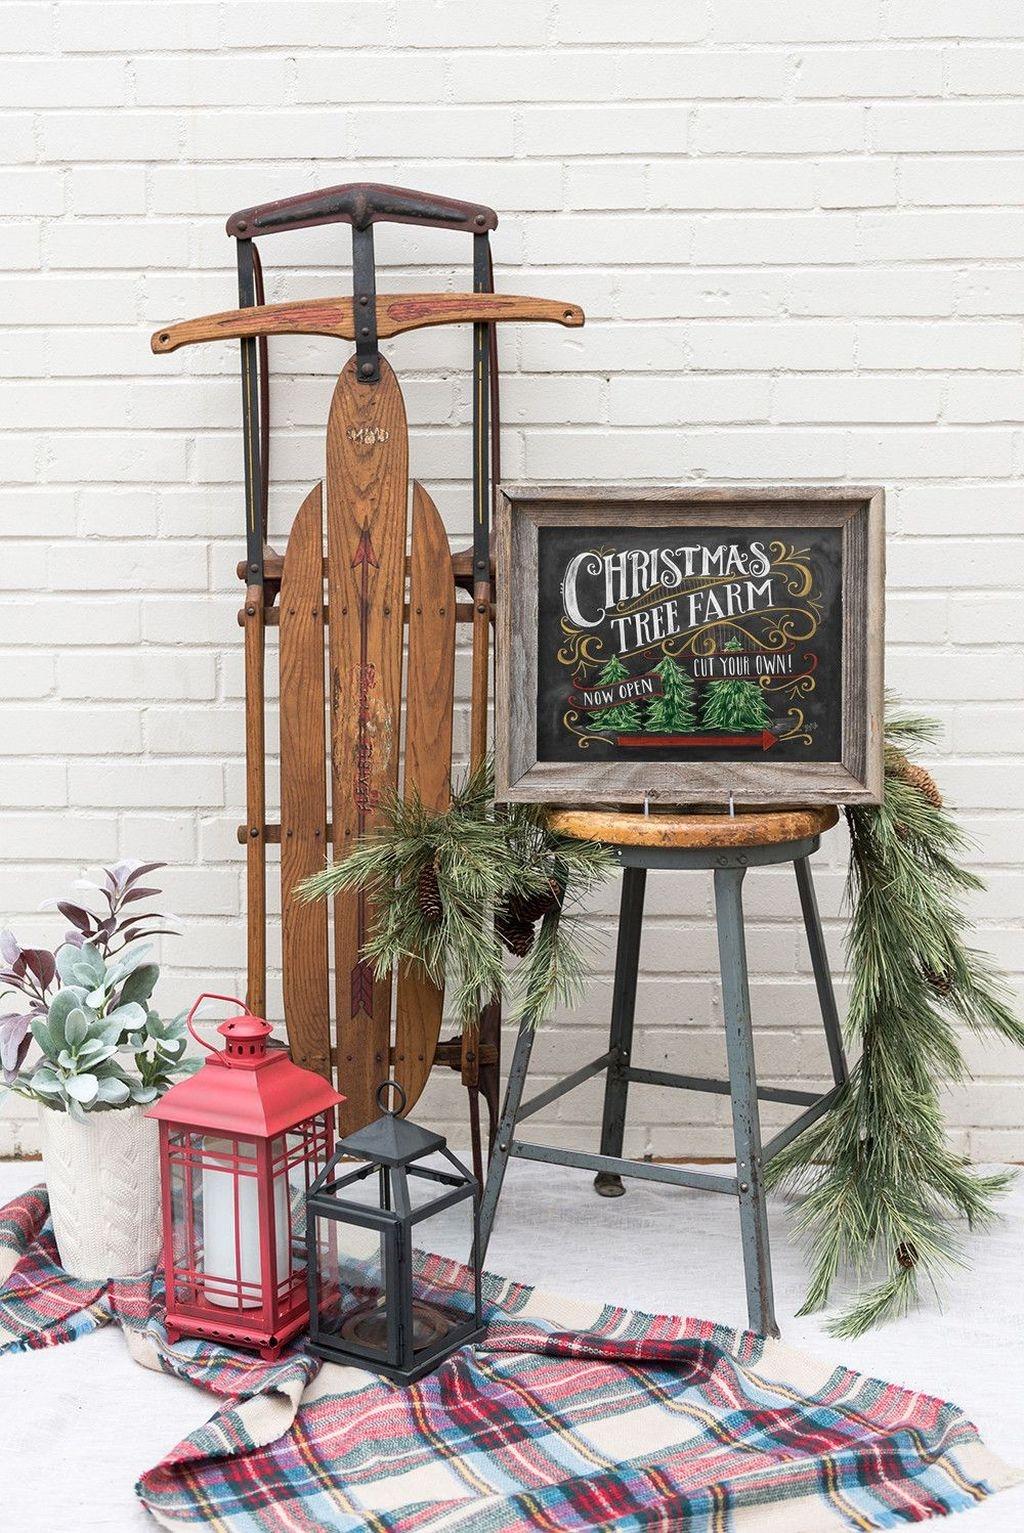 37 Totally Beautiful Vintage Christmas Tree Decoration Ideas 37